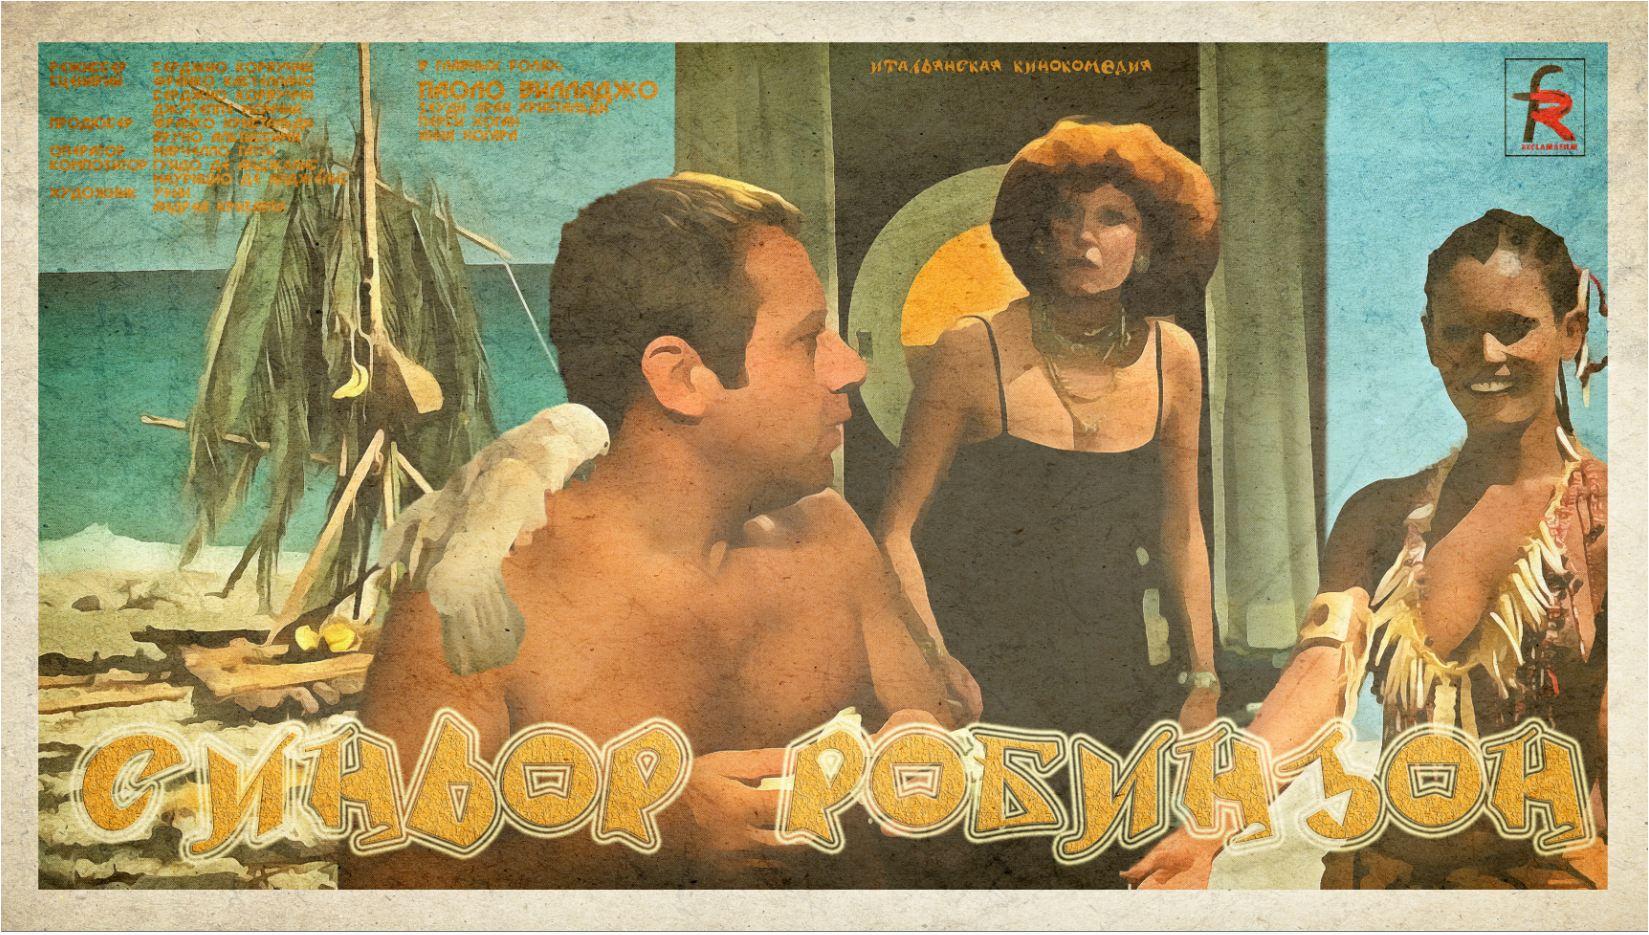 Синьор Робинзон (1976)